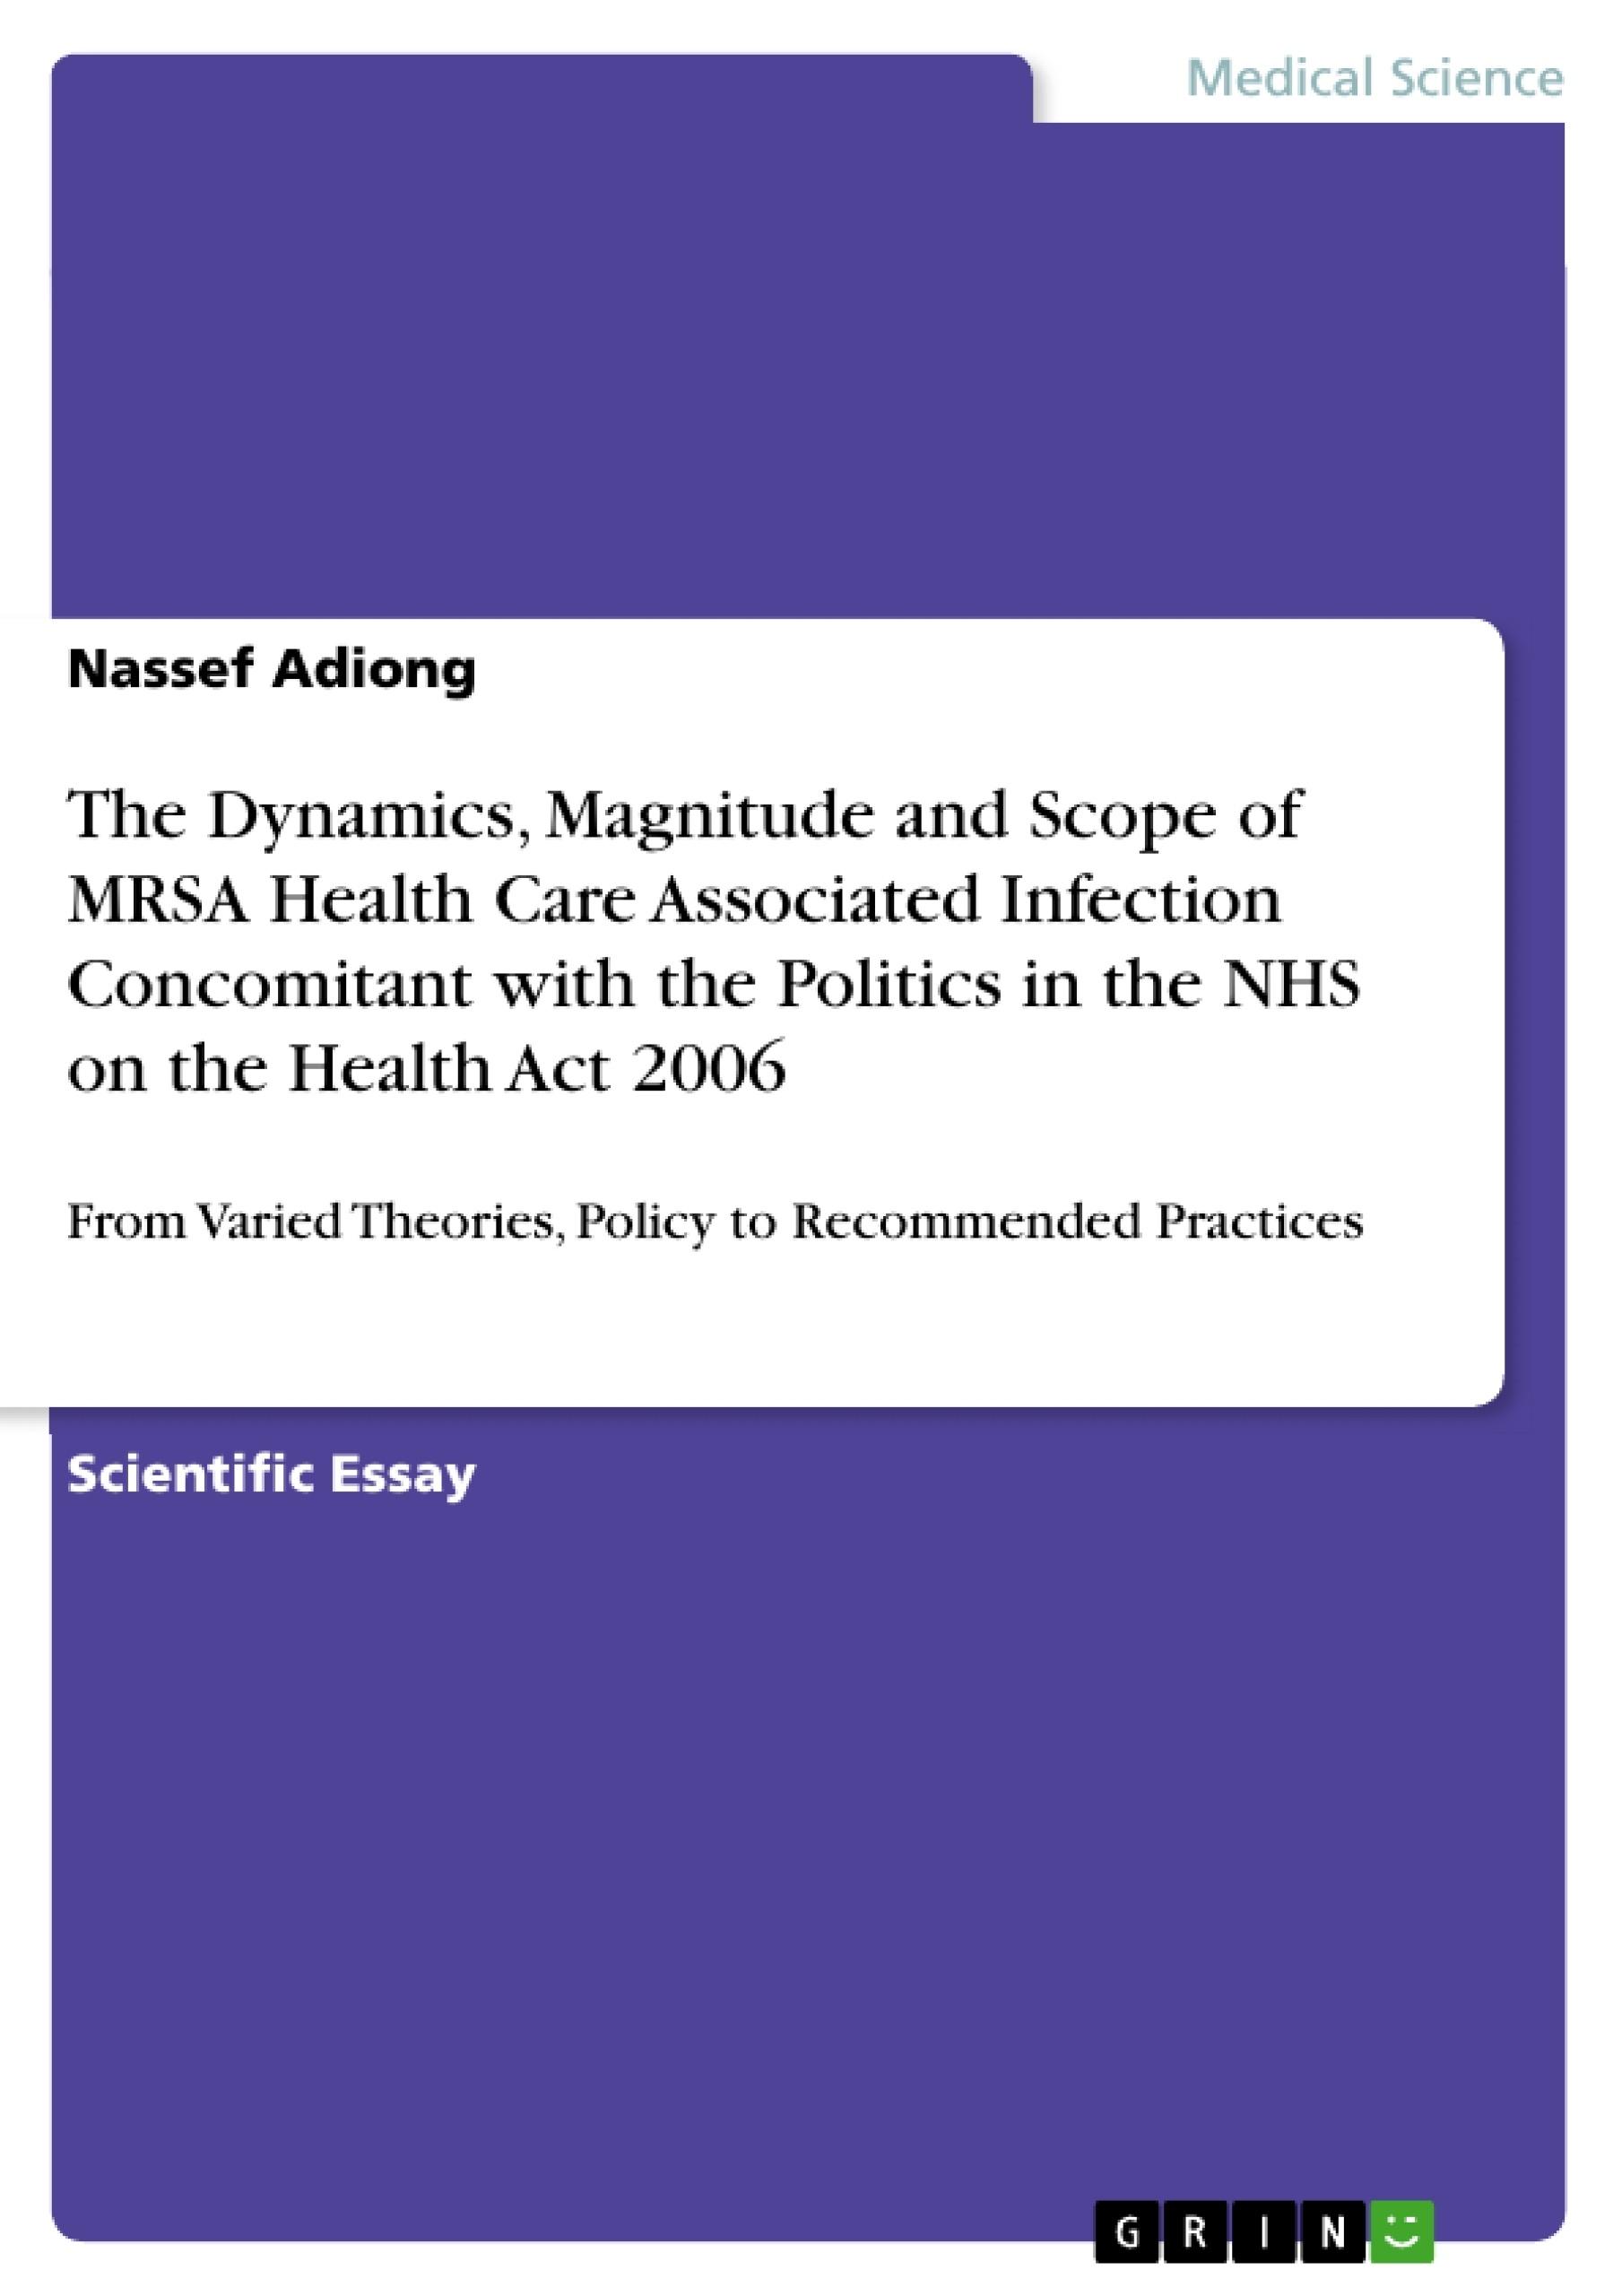 Essay on mrsa infection